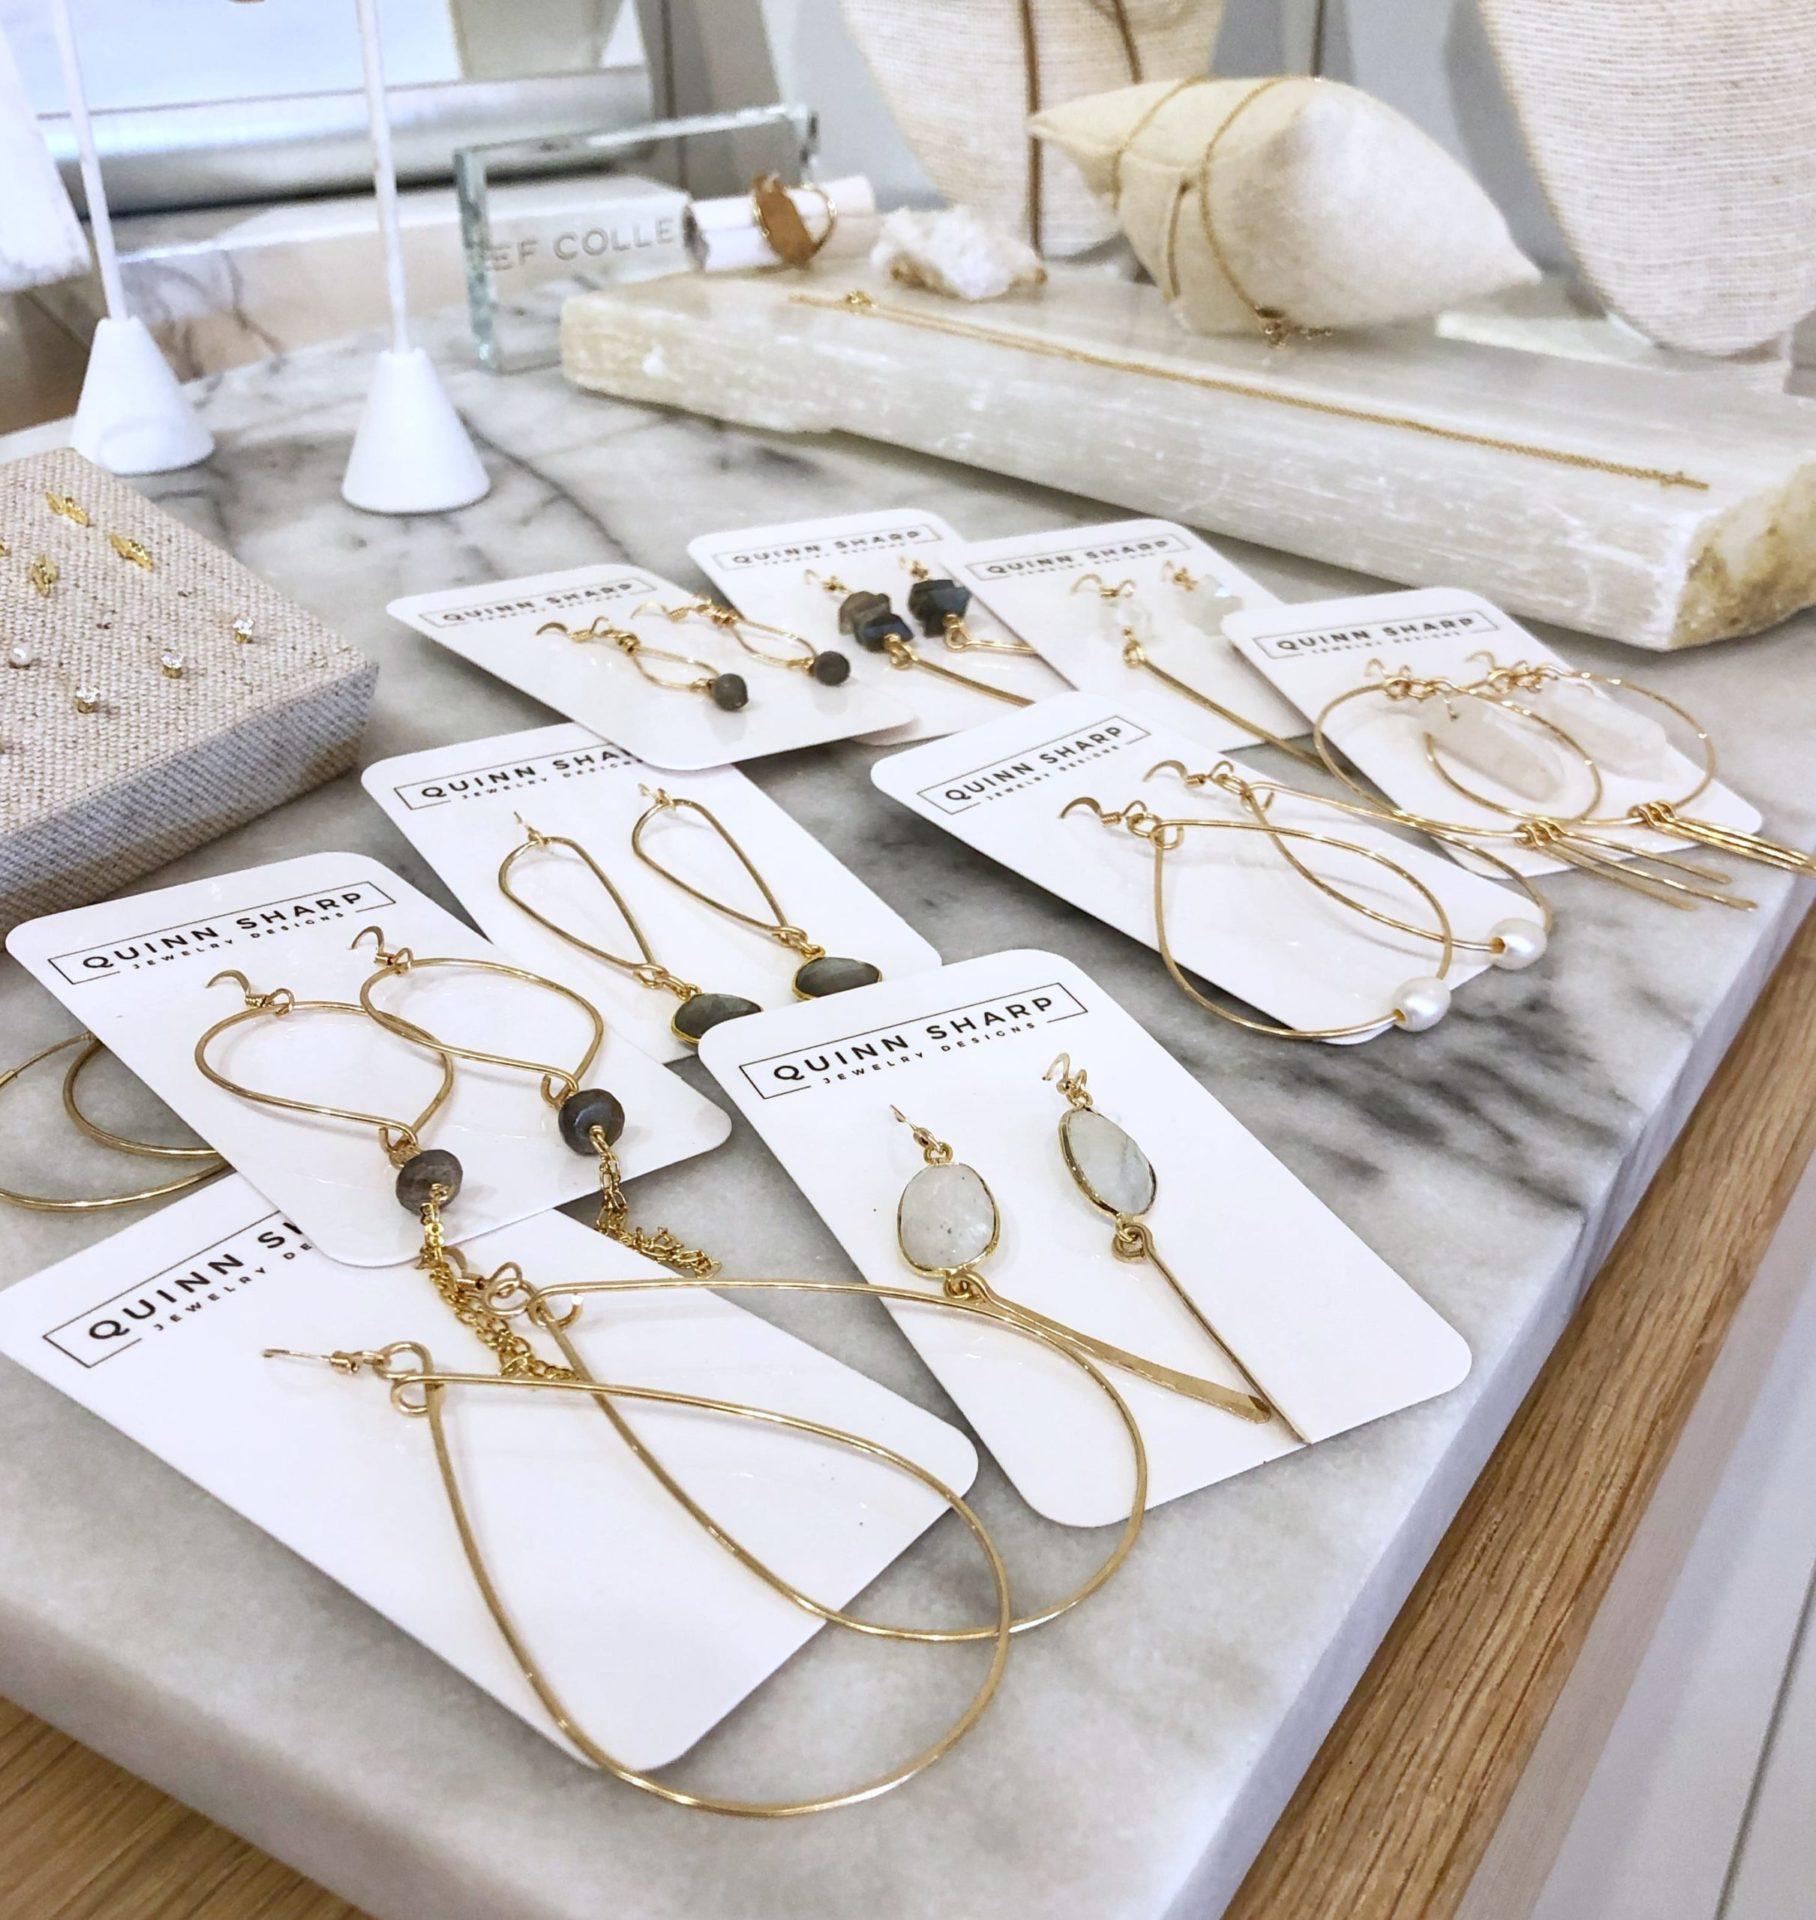 Quinn Sharp Jewelry Designs